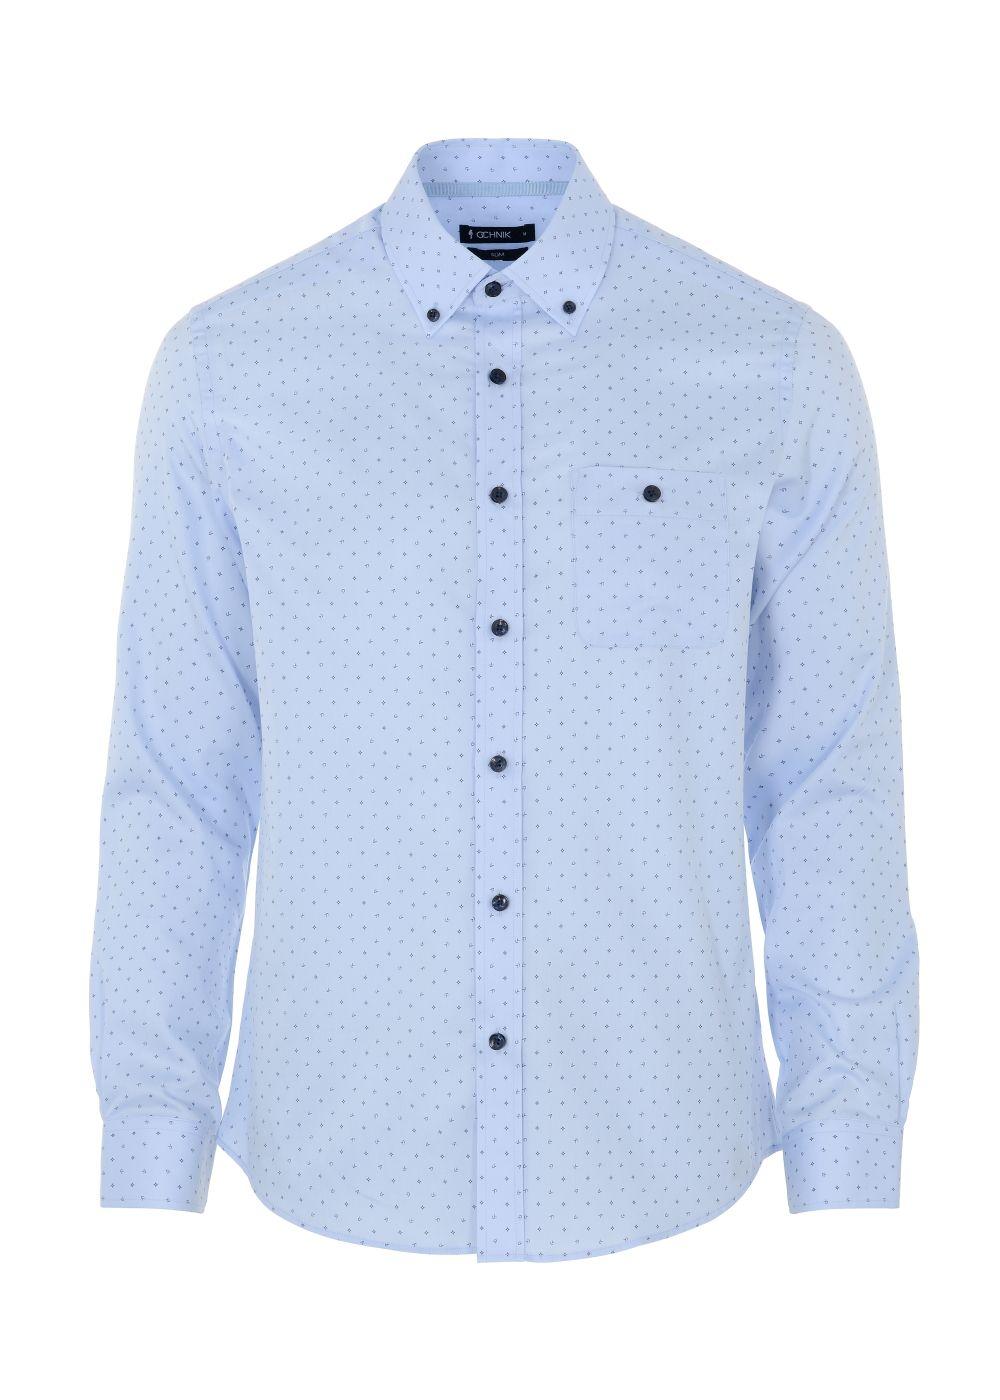 Koszula męska KOSMT-0246-60(W21)